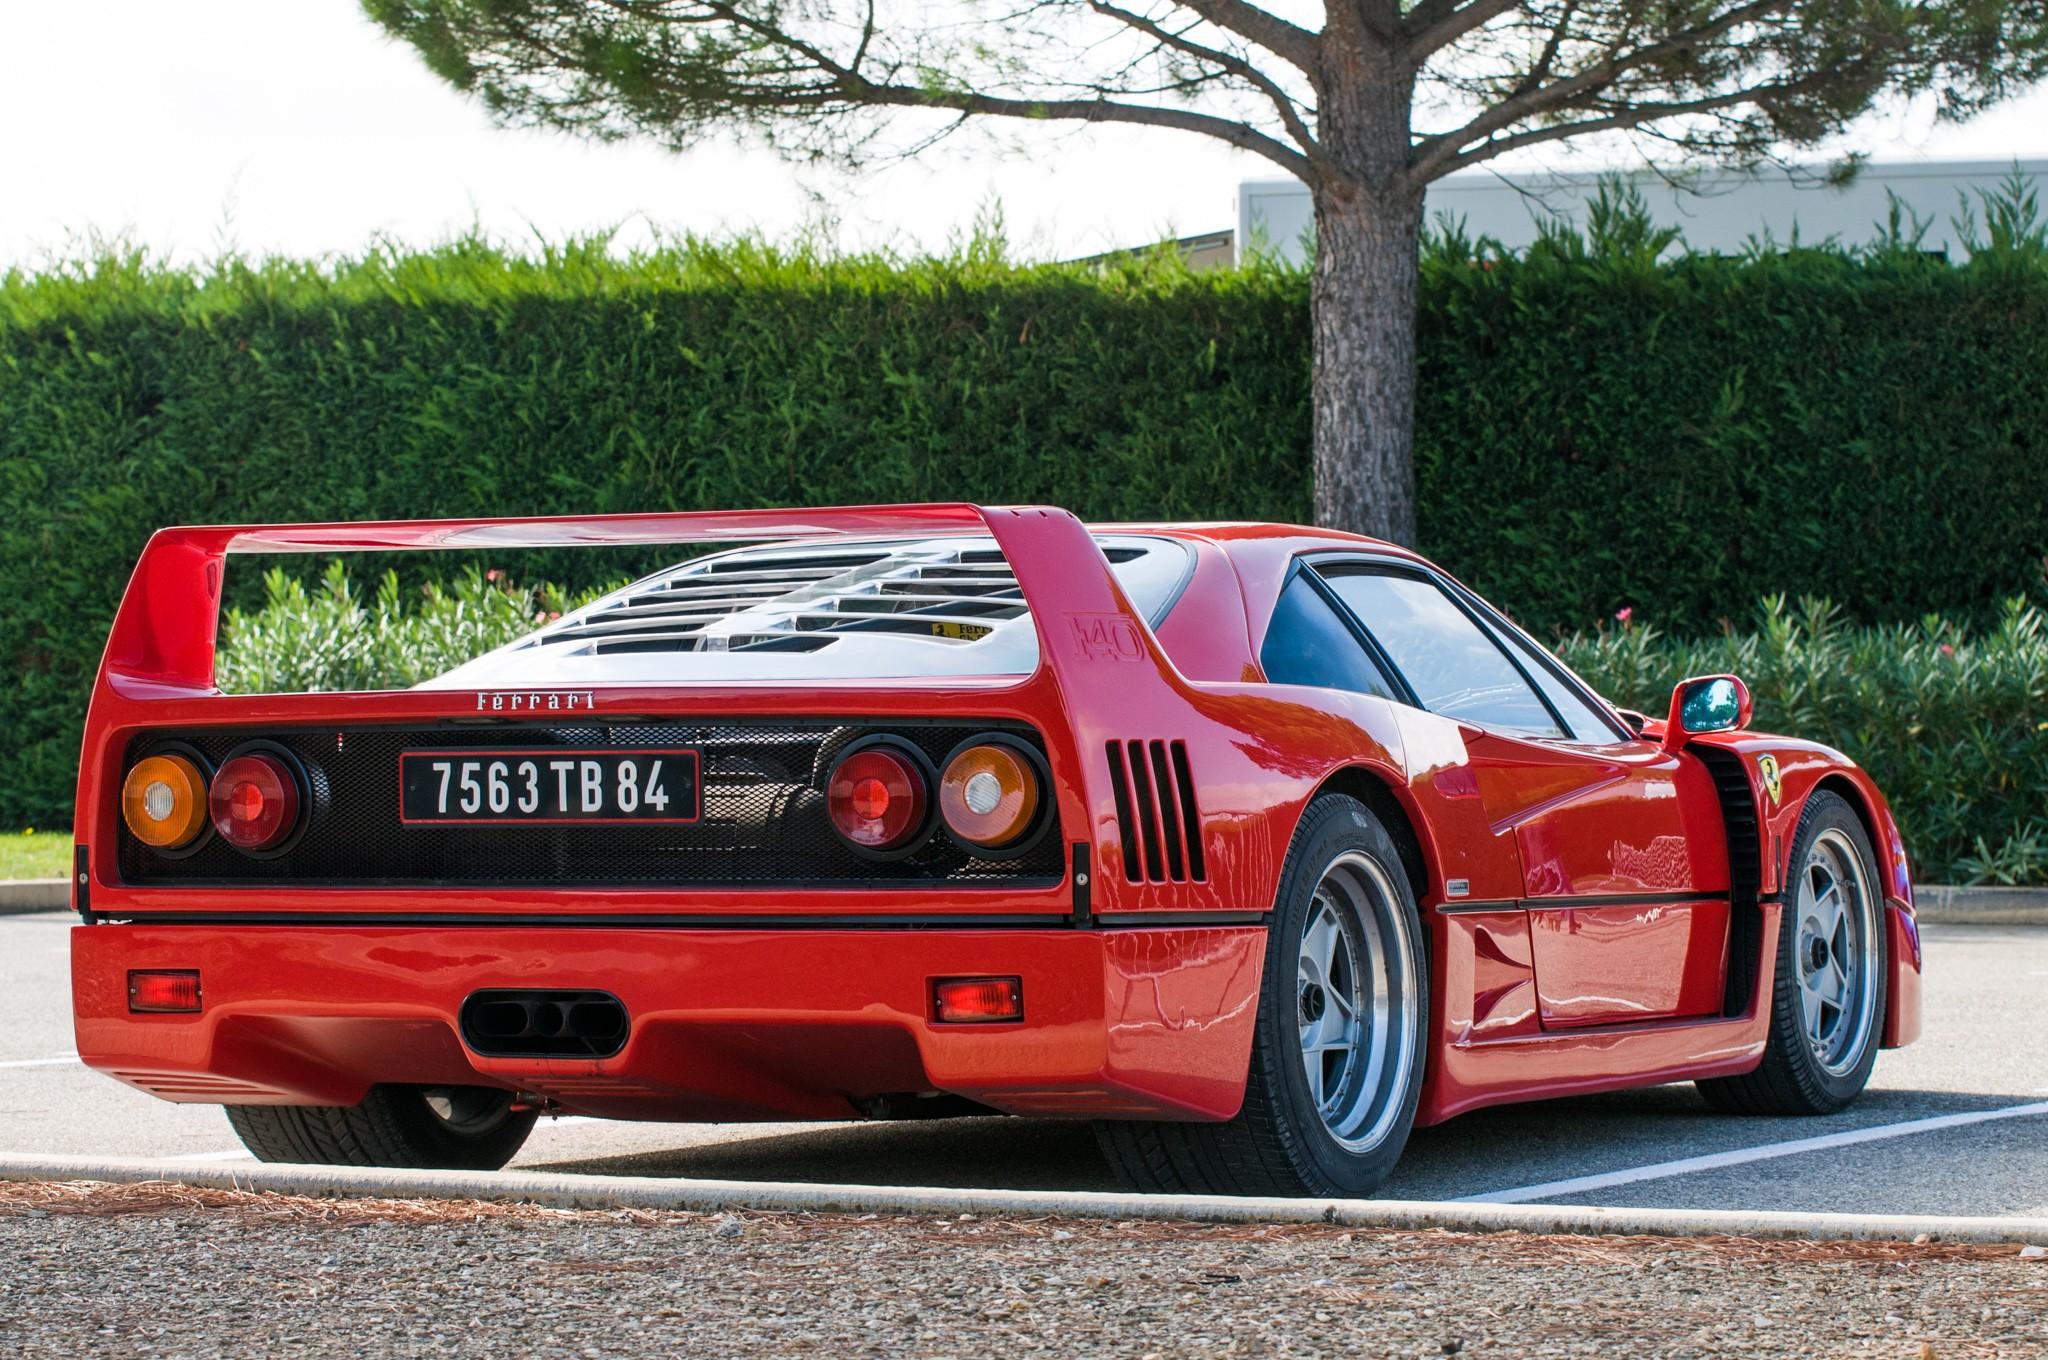 General 2048x1360 Ferrari F40 red Ferrari F40 red cars vehicle